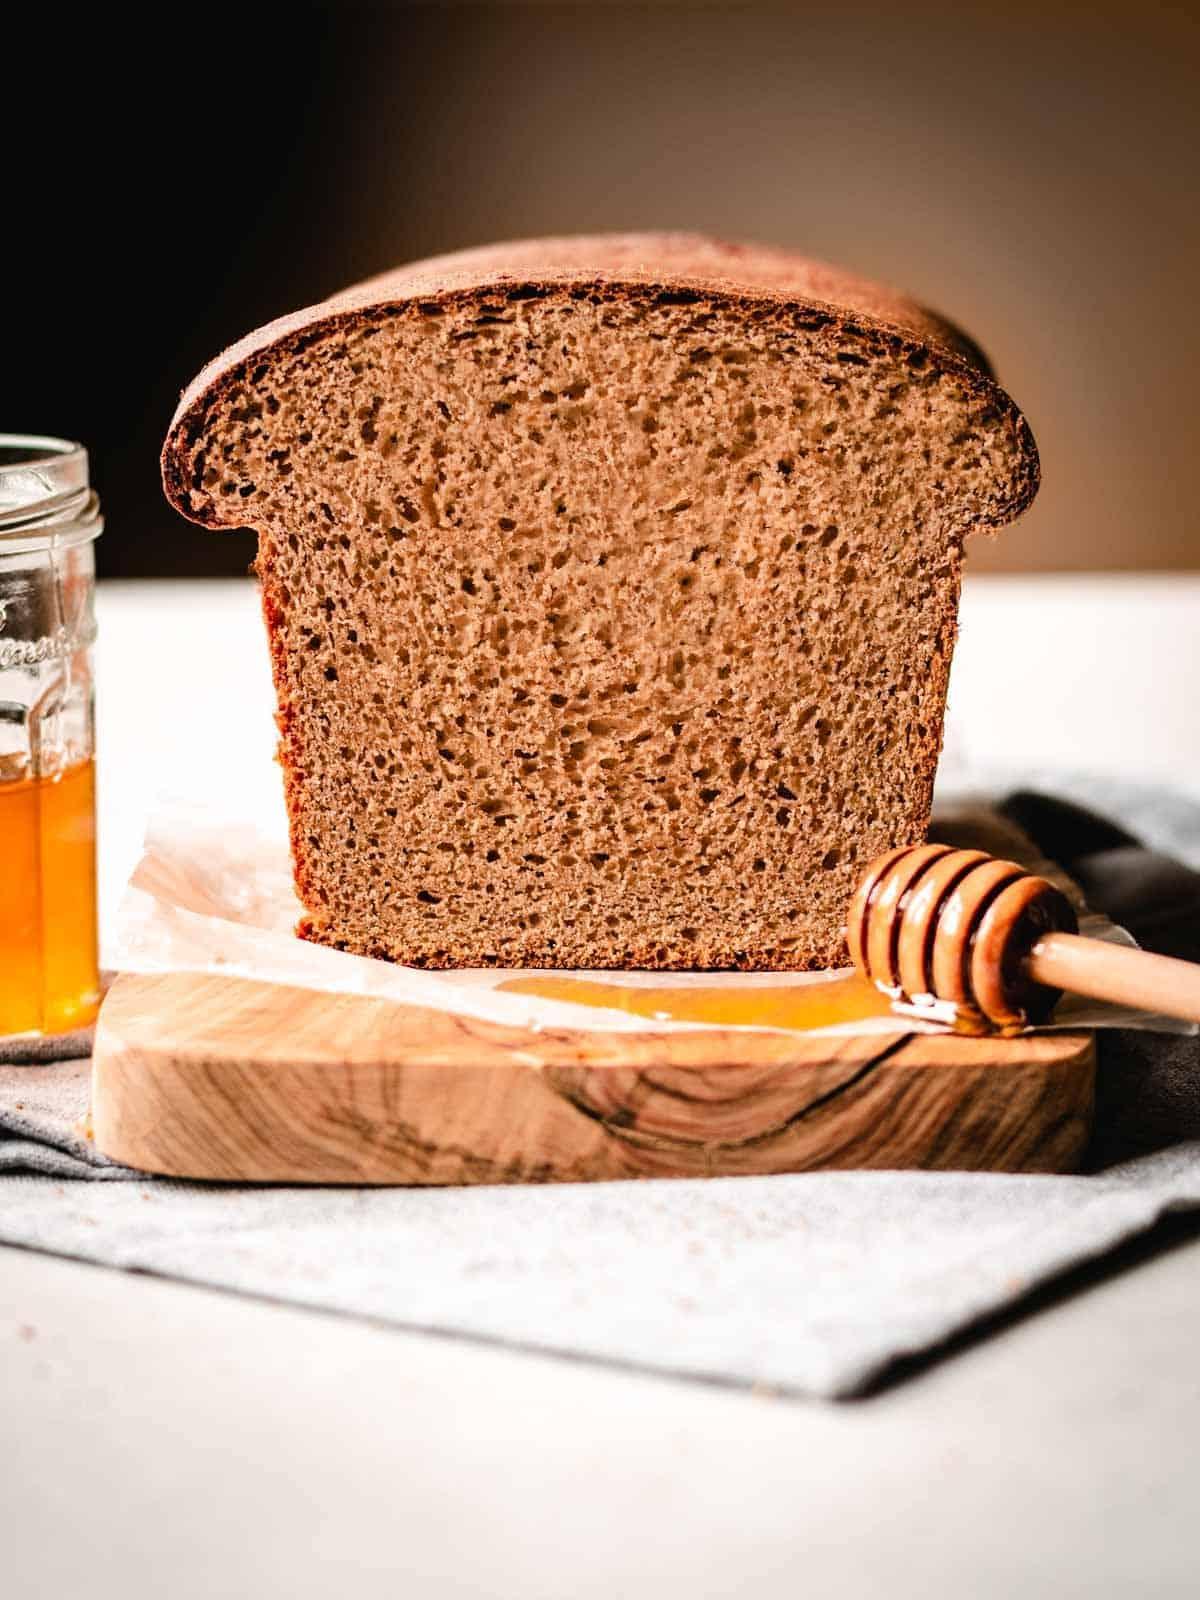 crumb shot of honey whole wheat sandwich bread